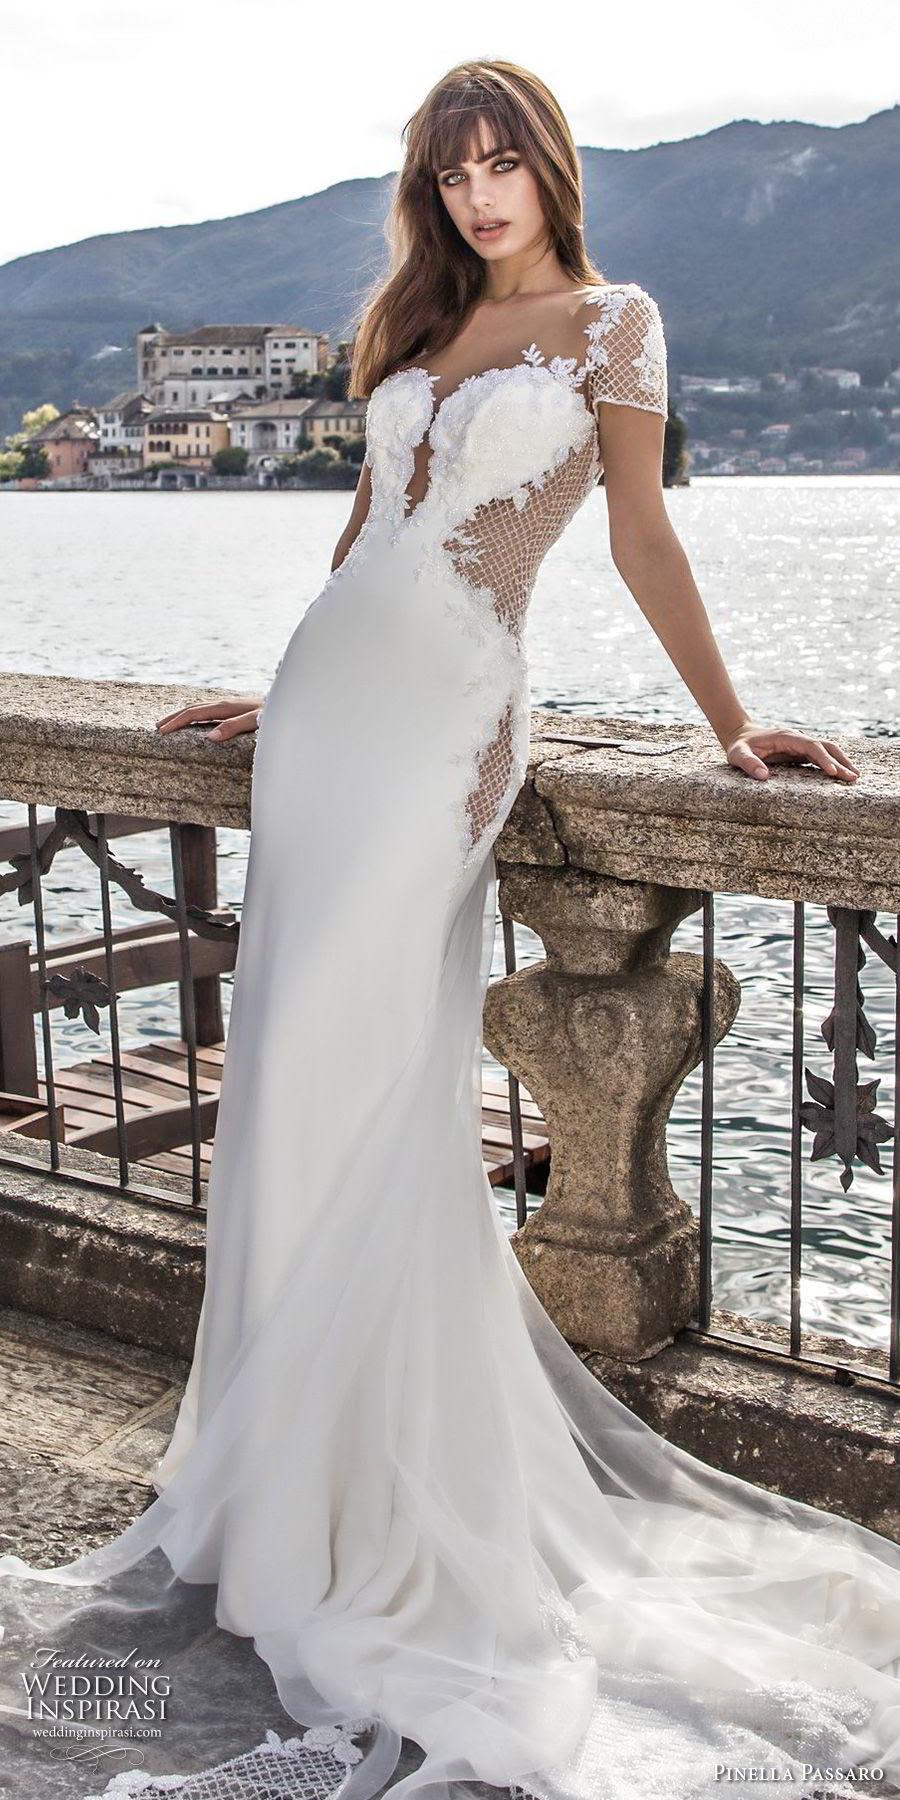 Pregnancy with where to buy a wedding dress in nyc hip zalando